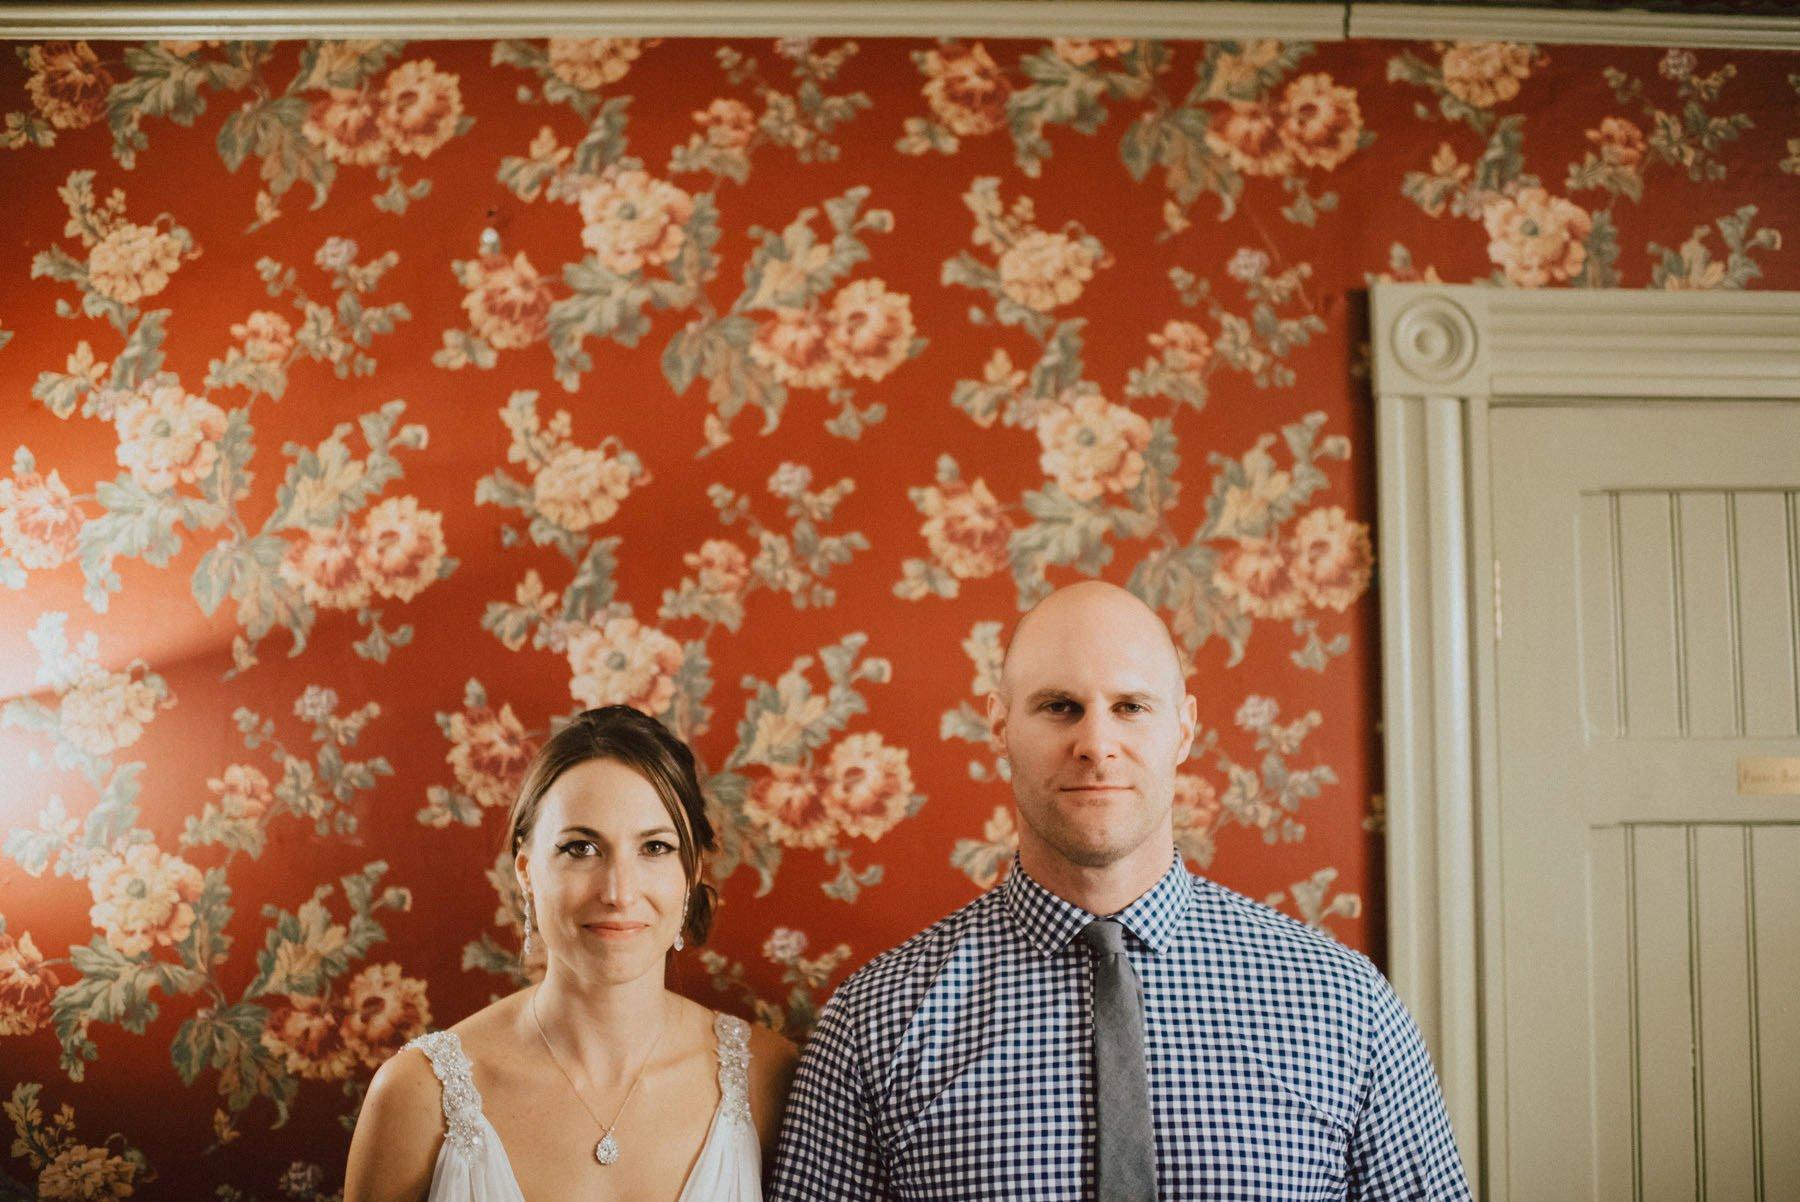 faunbrook-bed-and-breakfast-wedding-127.jpg